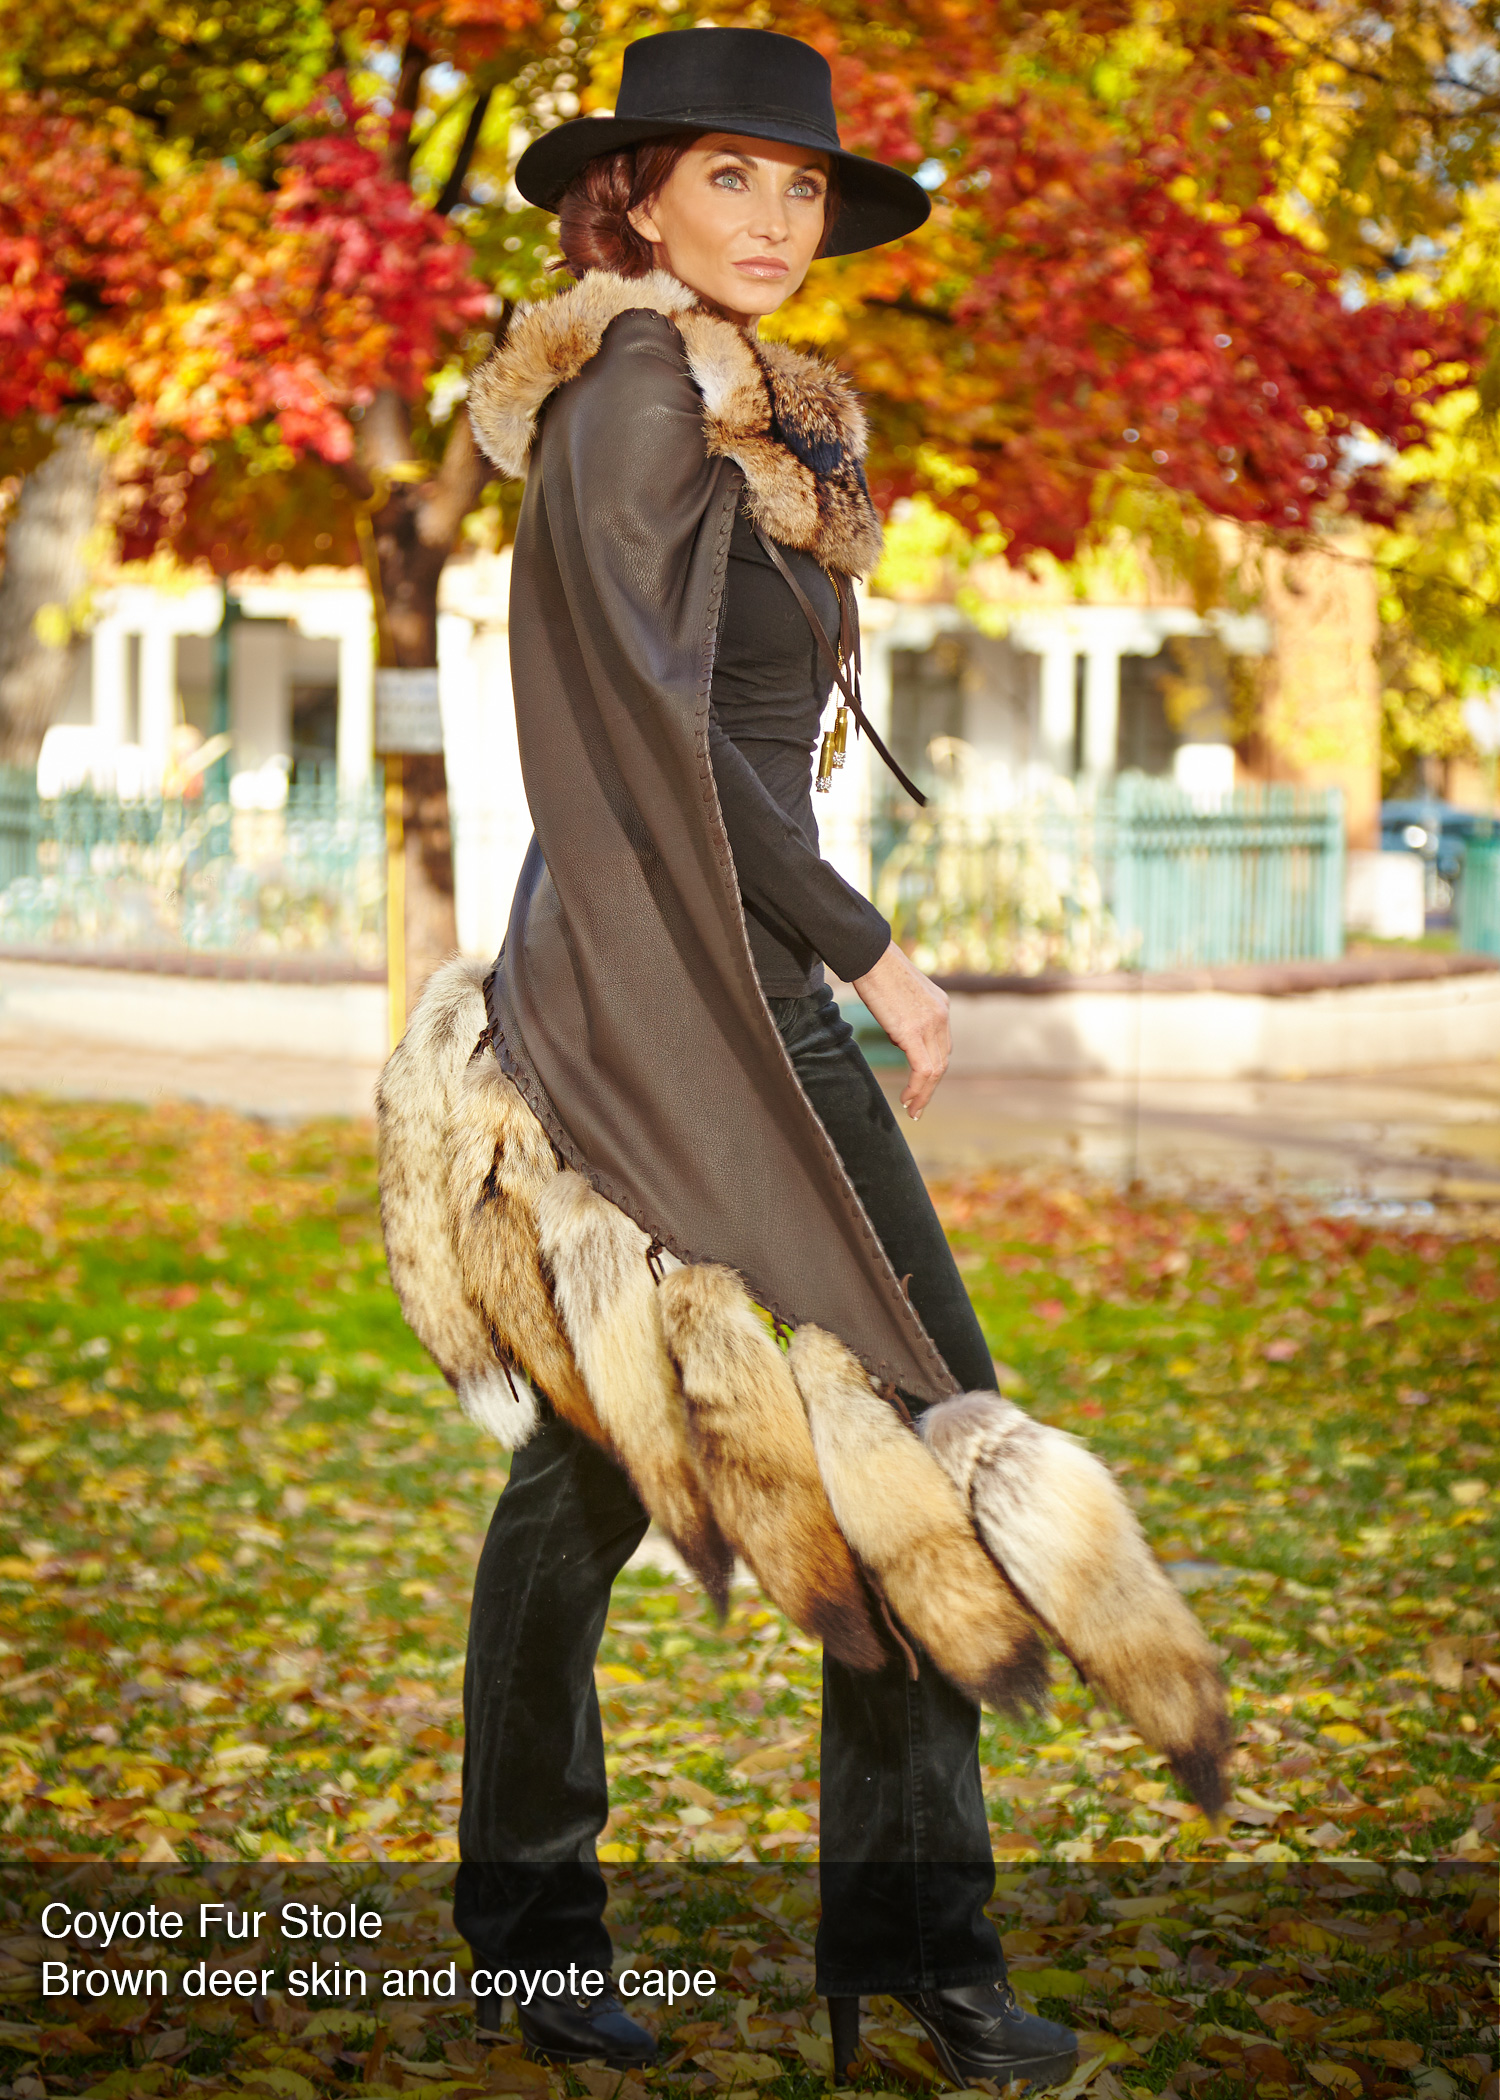 CoyoteCouture_deer_skin_cape.jpg